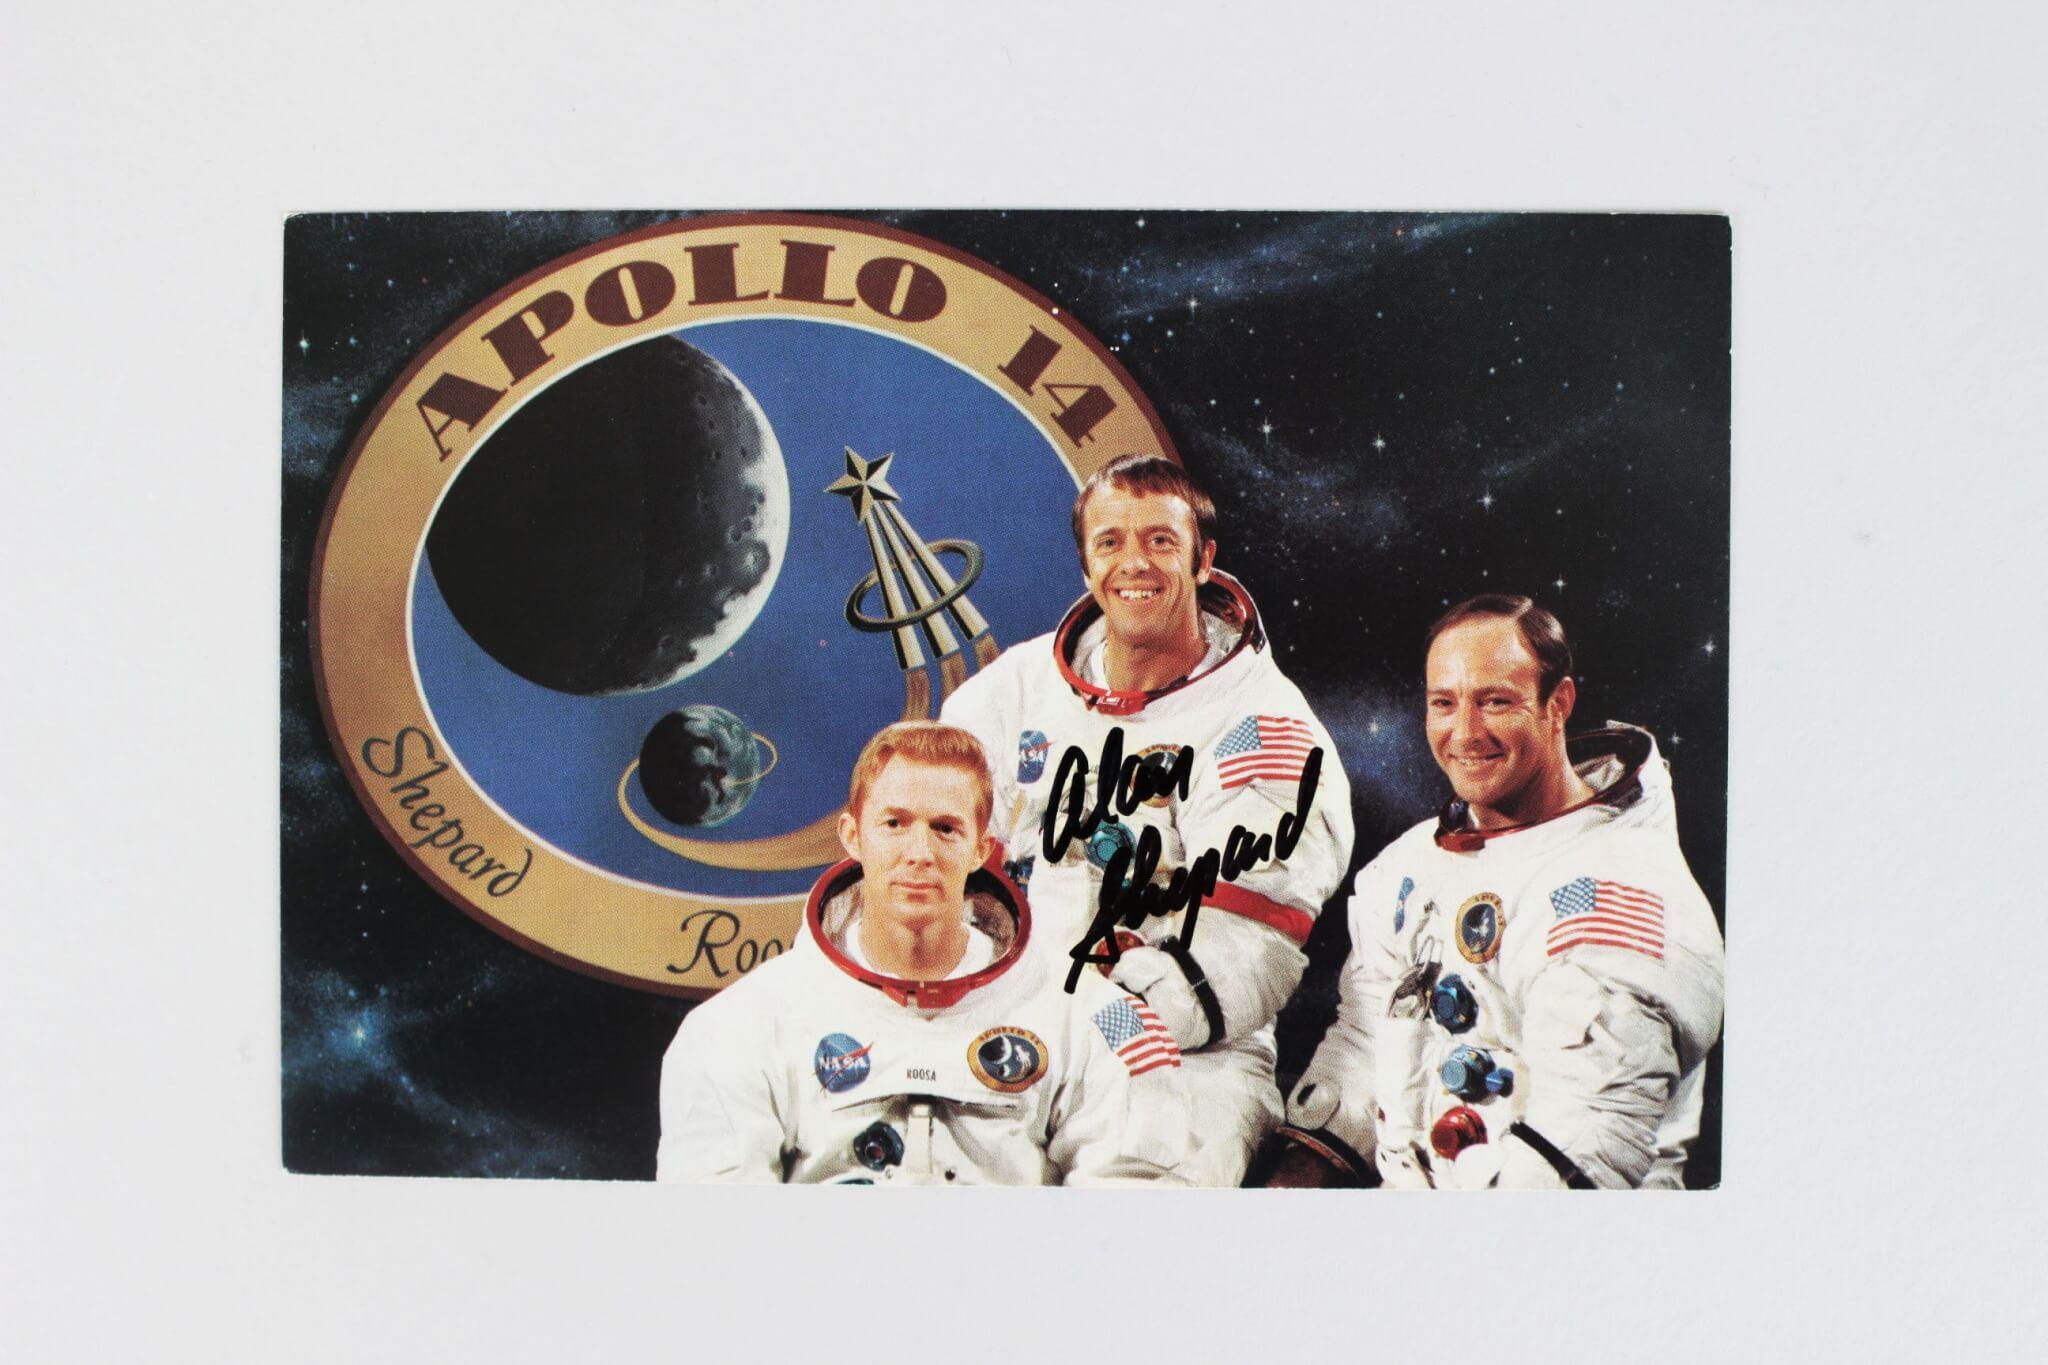 Alan Shepard Signed Photo - JSA